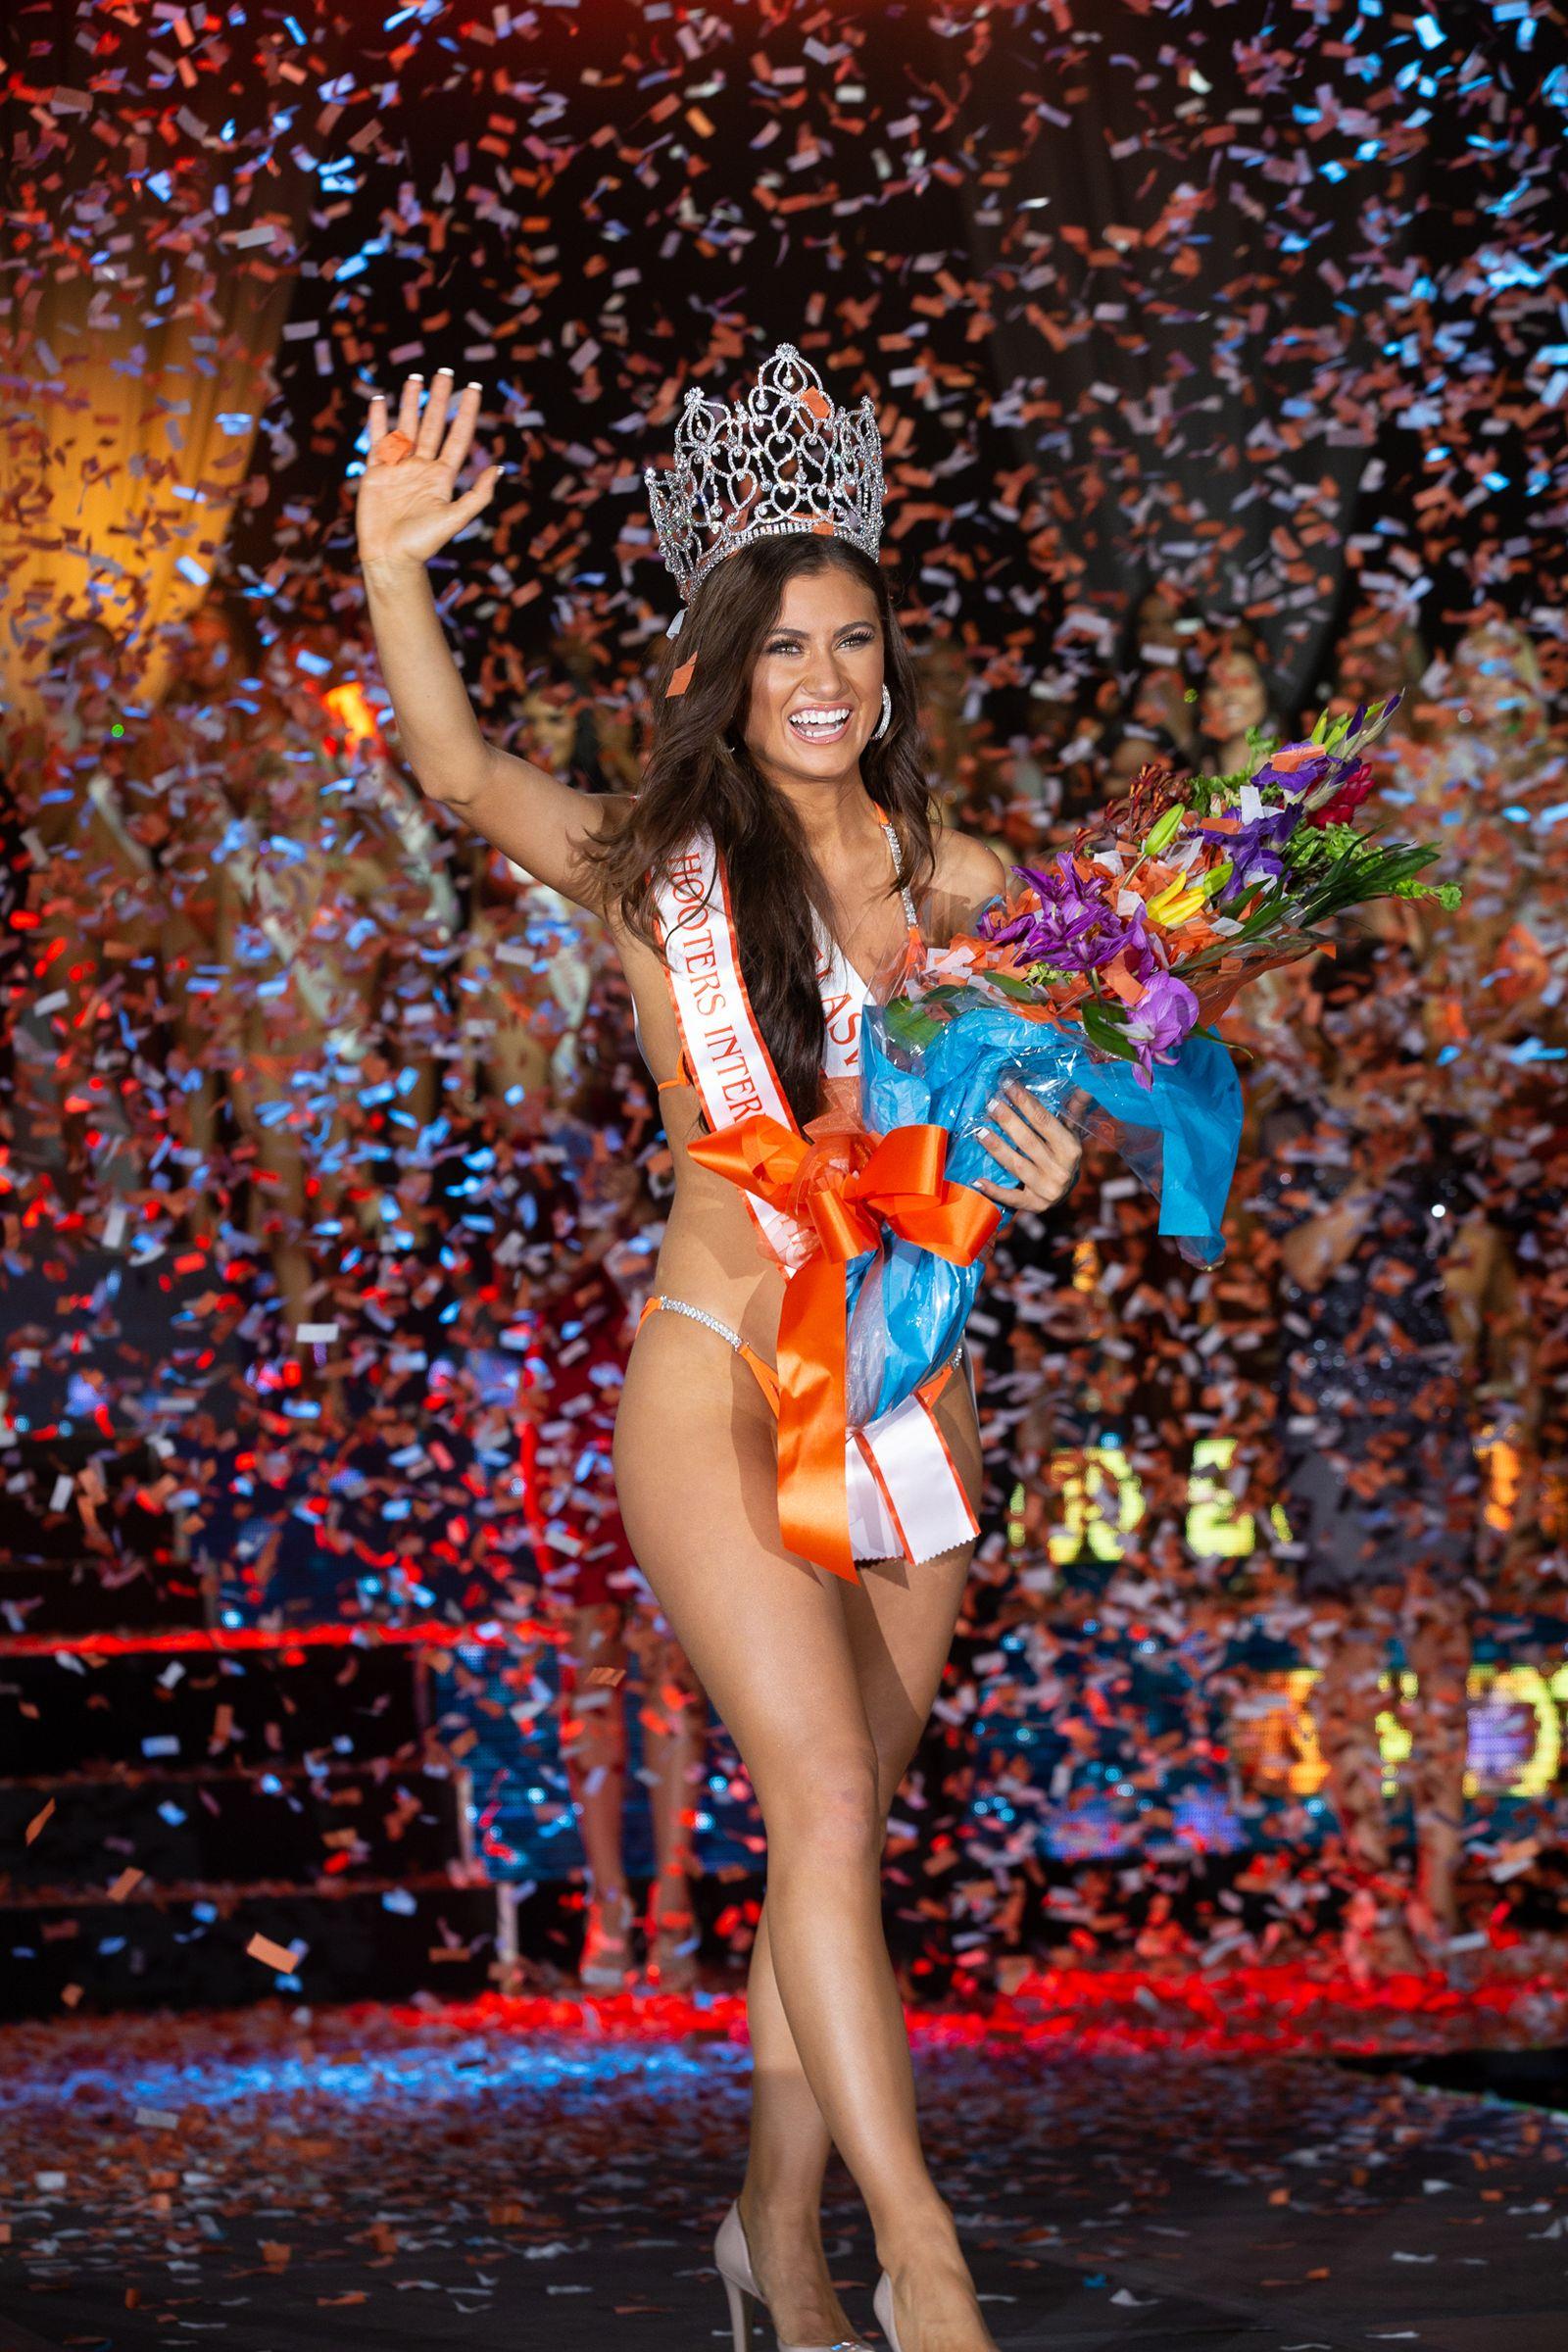 Abby Hooters Calendar May : Laiken baumgartner crowned miss hooters international